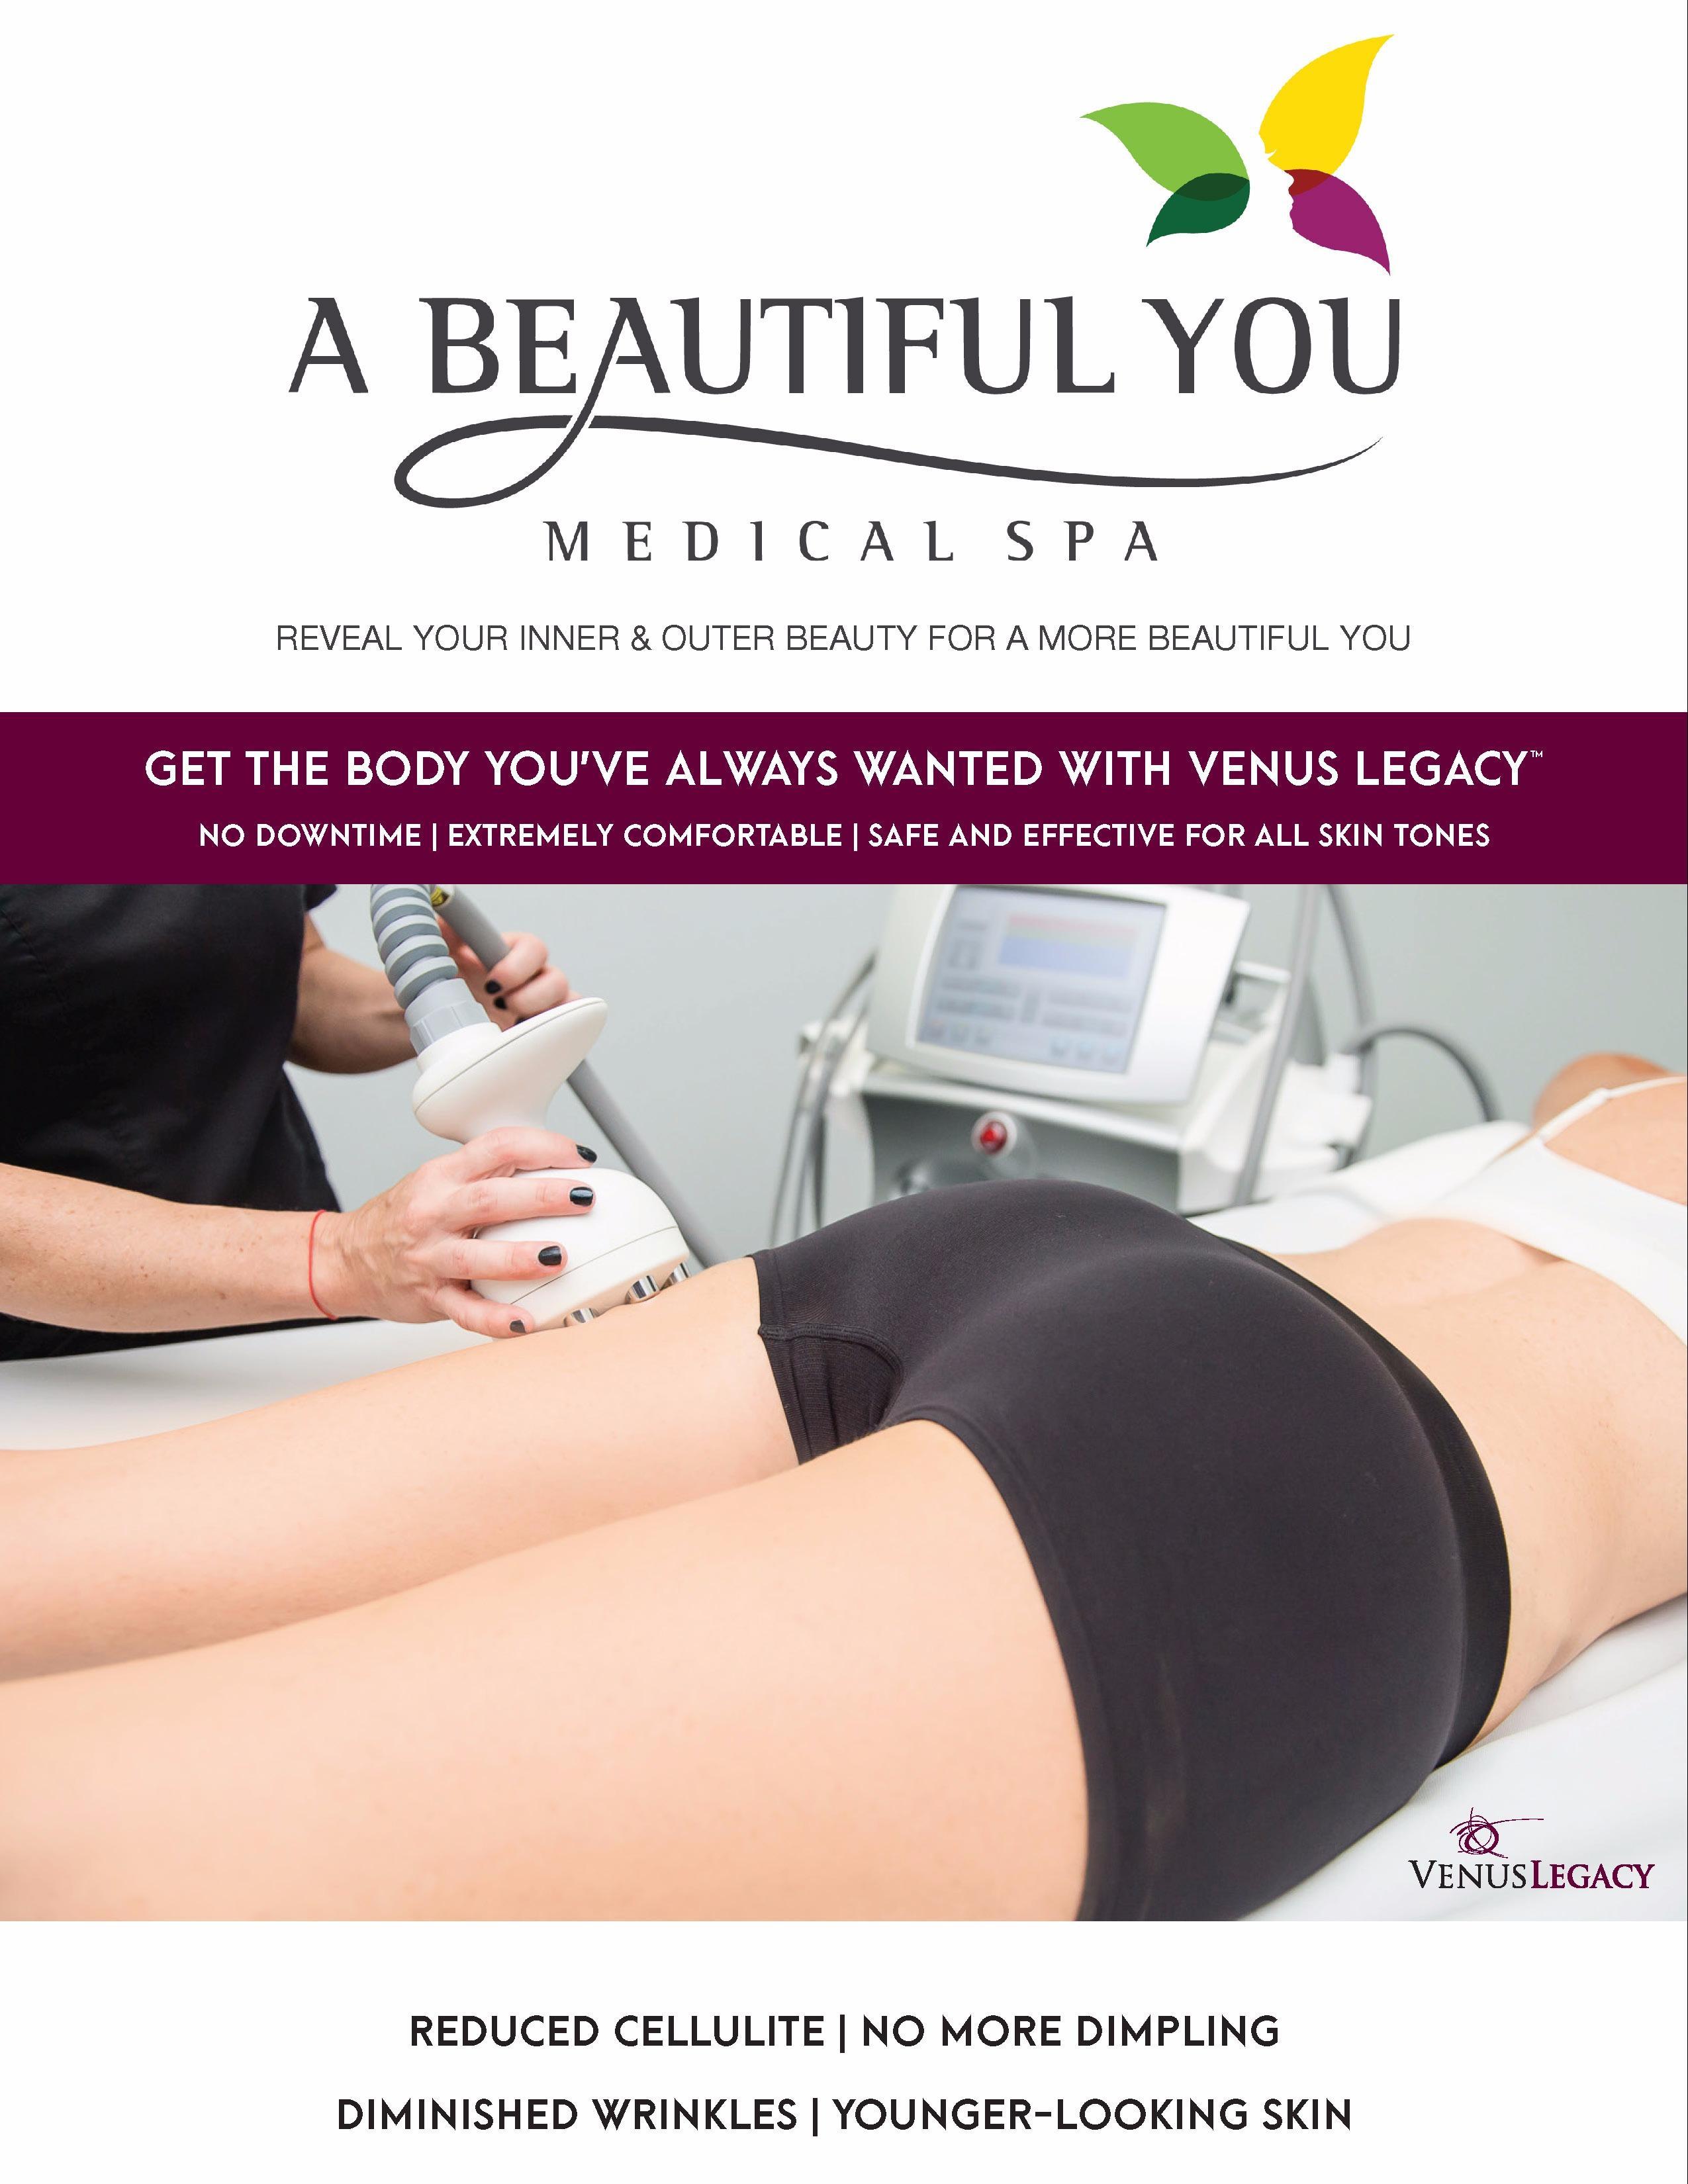 A Beautiful You Medical Spa image 9